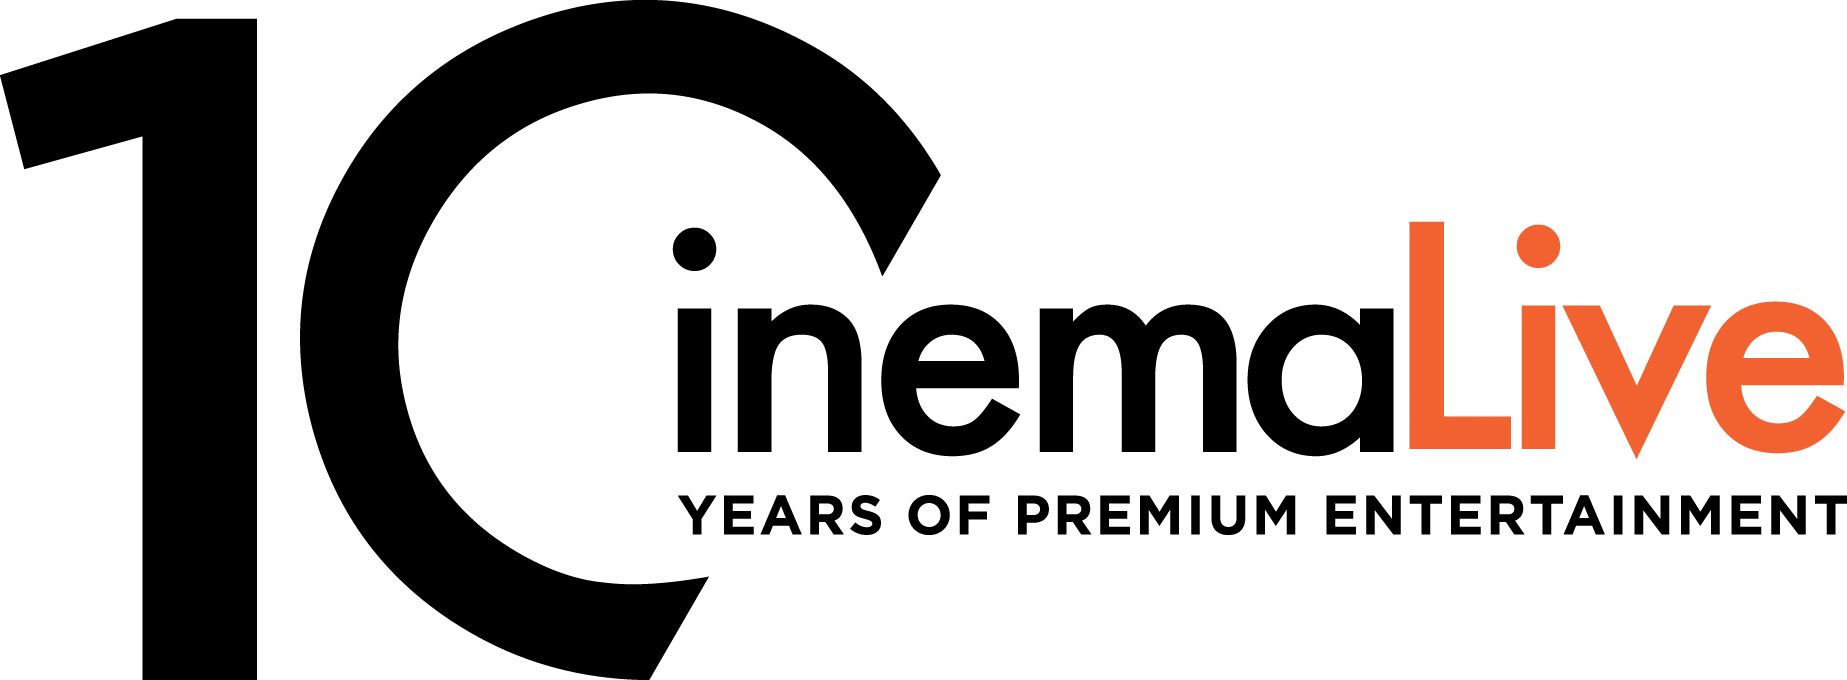 cinemalive logo